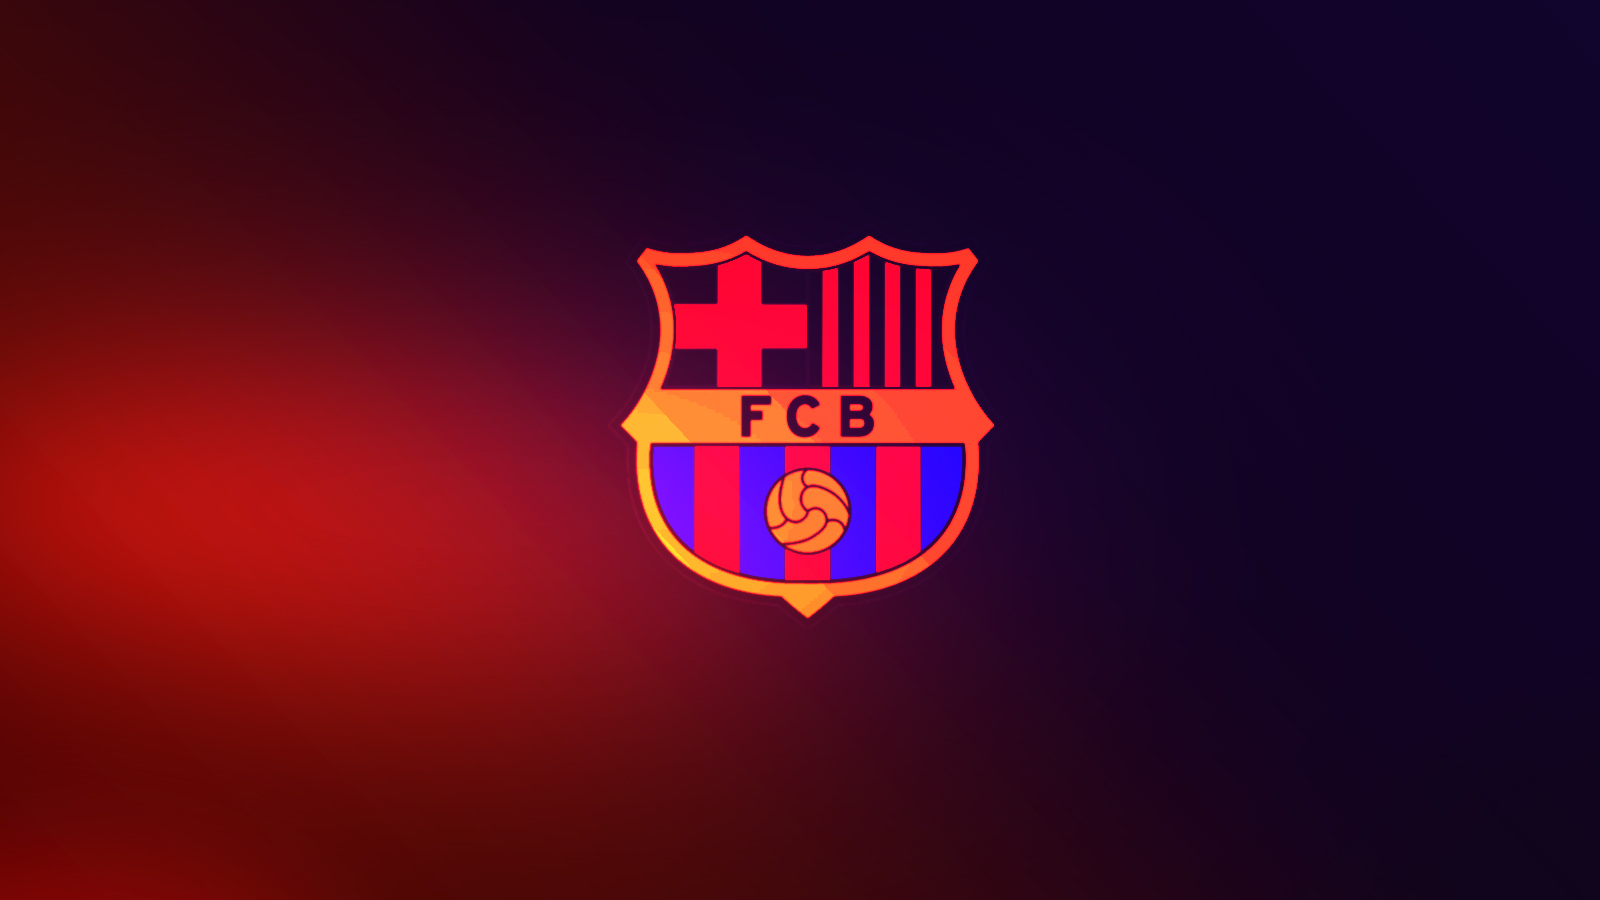 Fc Barcelona Logo Wallpapers Wallpaper 1600x900